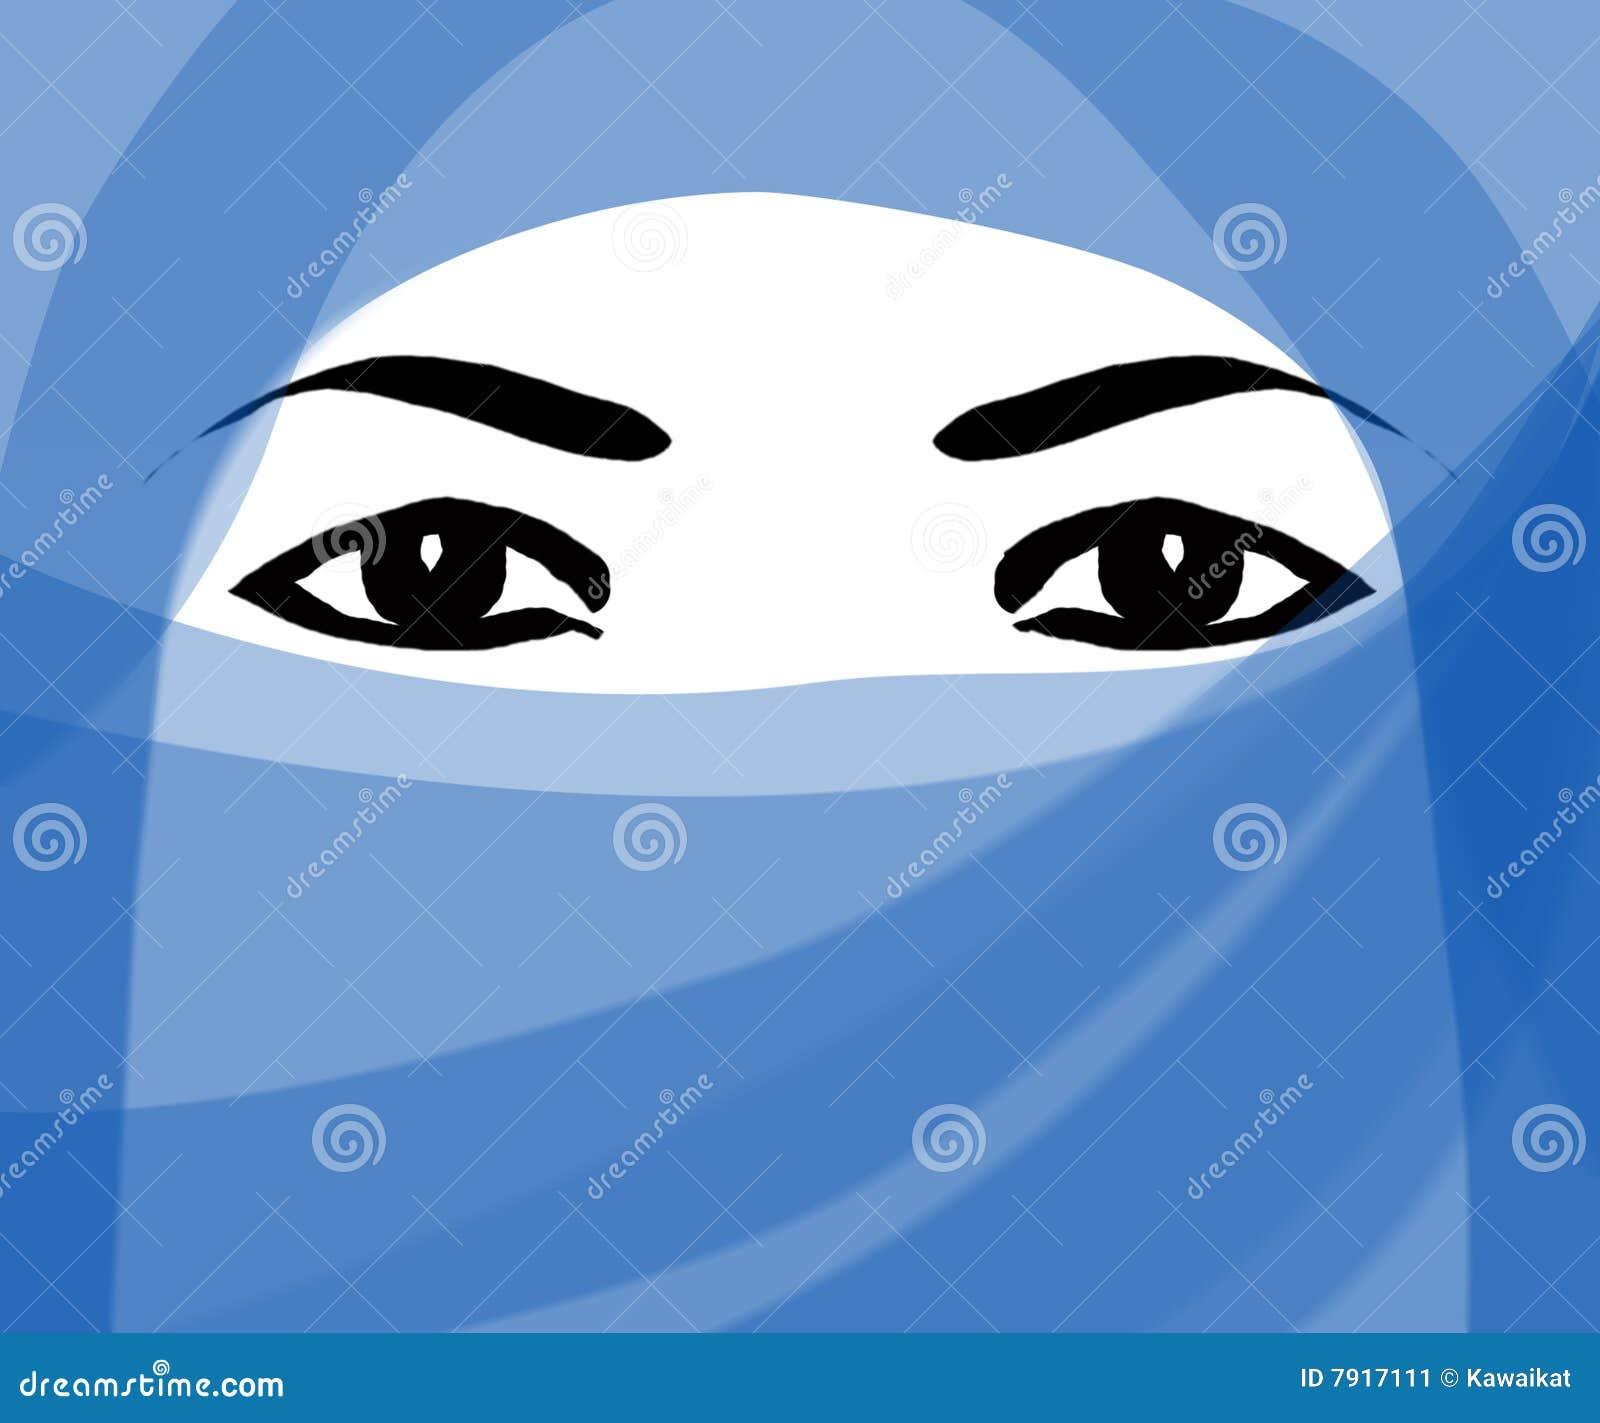 Middle Eastern woman Middle East Women Eyes